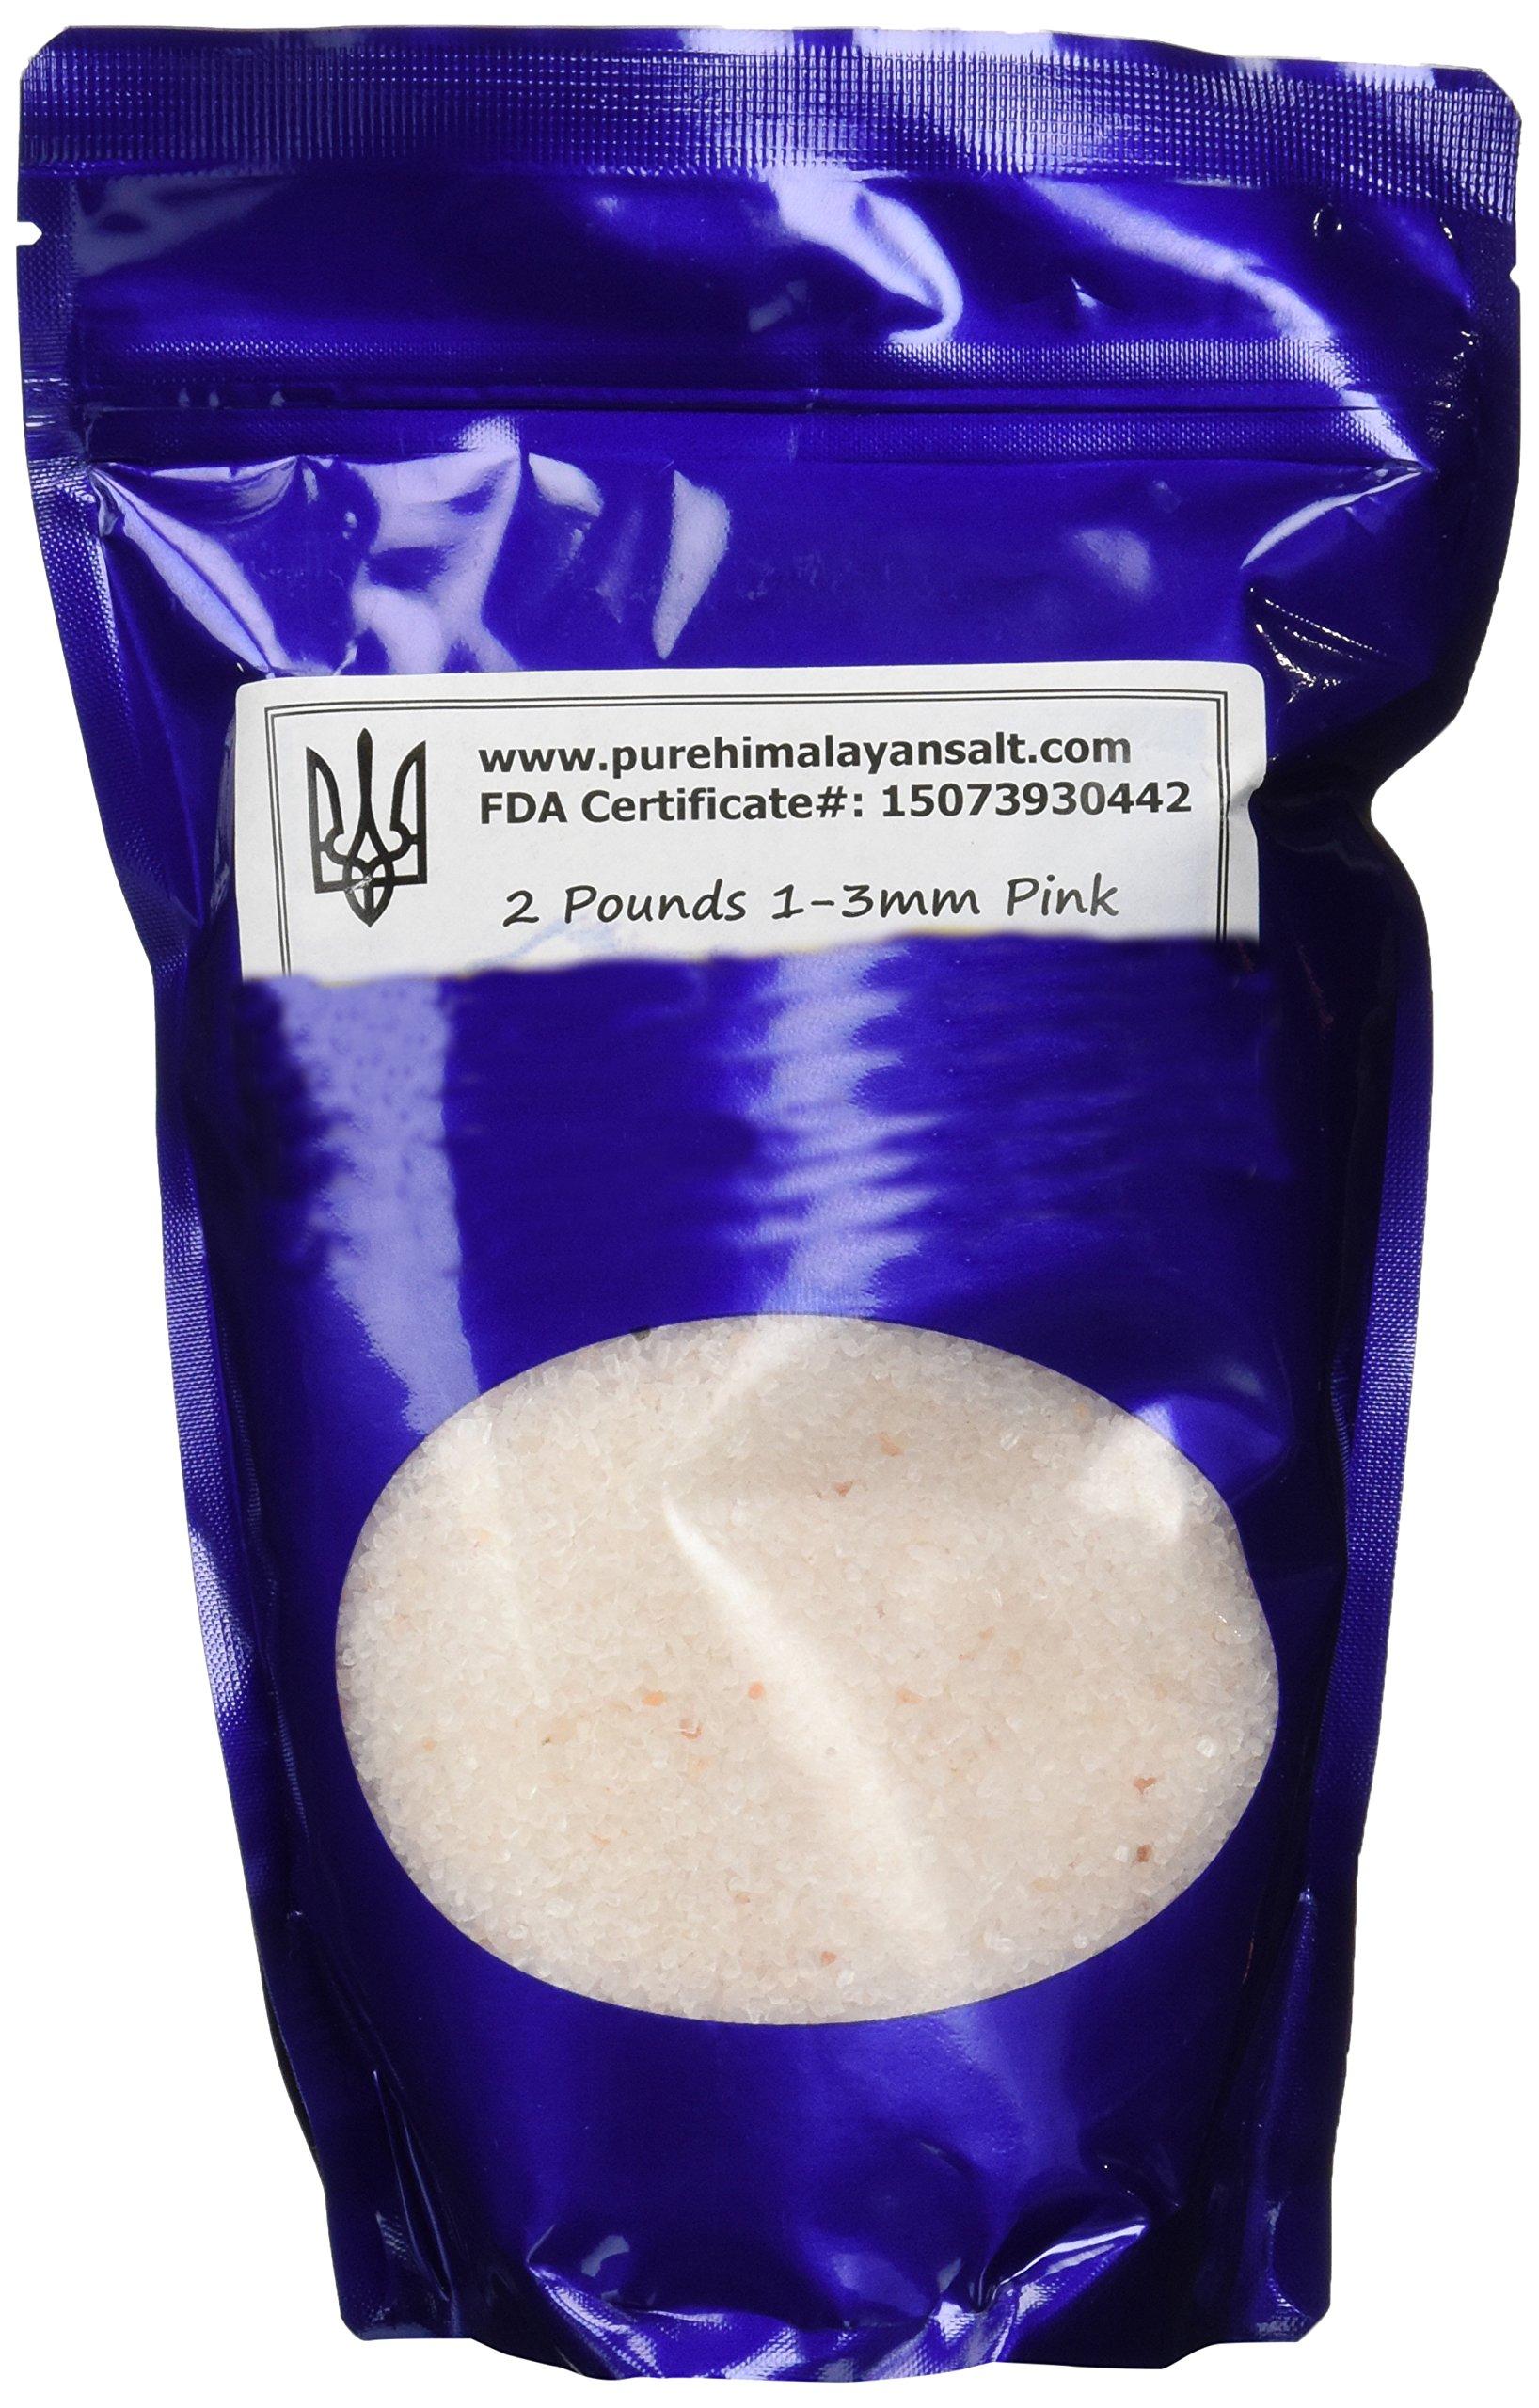 Pink Himalayan Salt 2 Pounds 1-3mm Ideal for Grinder FDA Approved No Additives or Chemicals